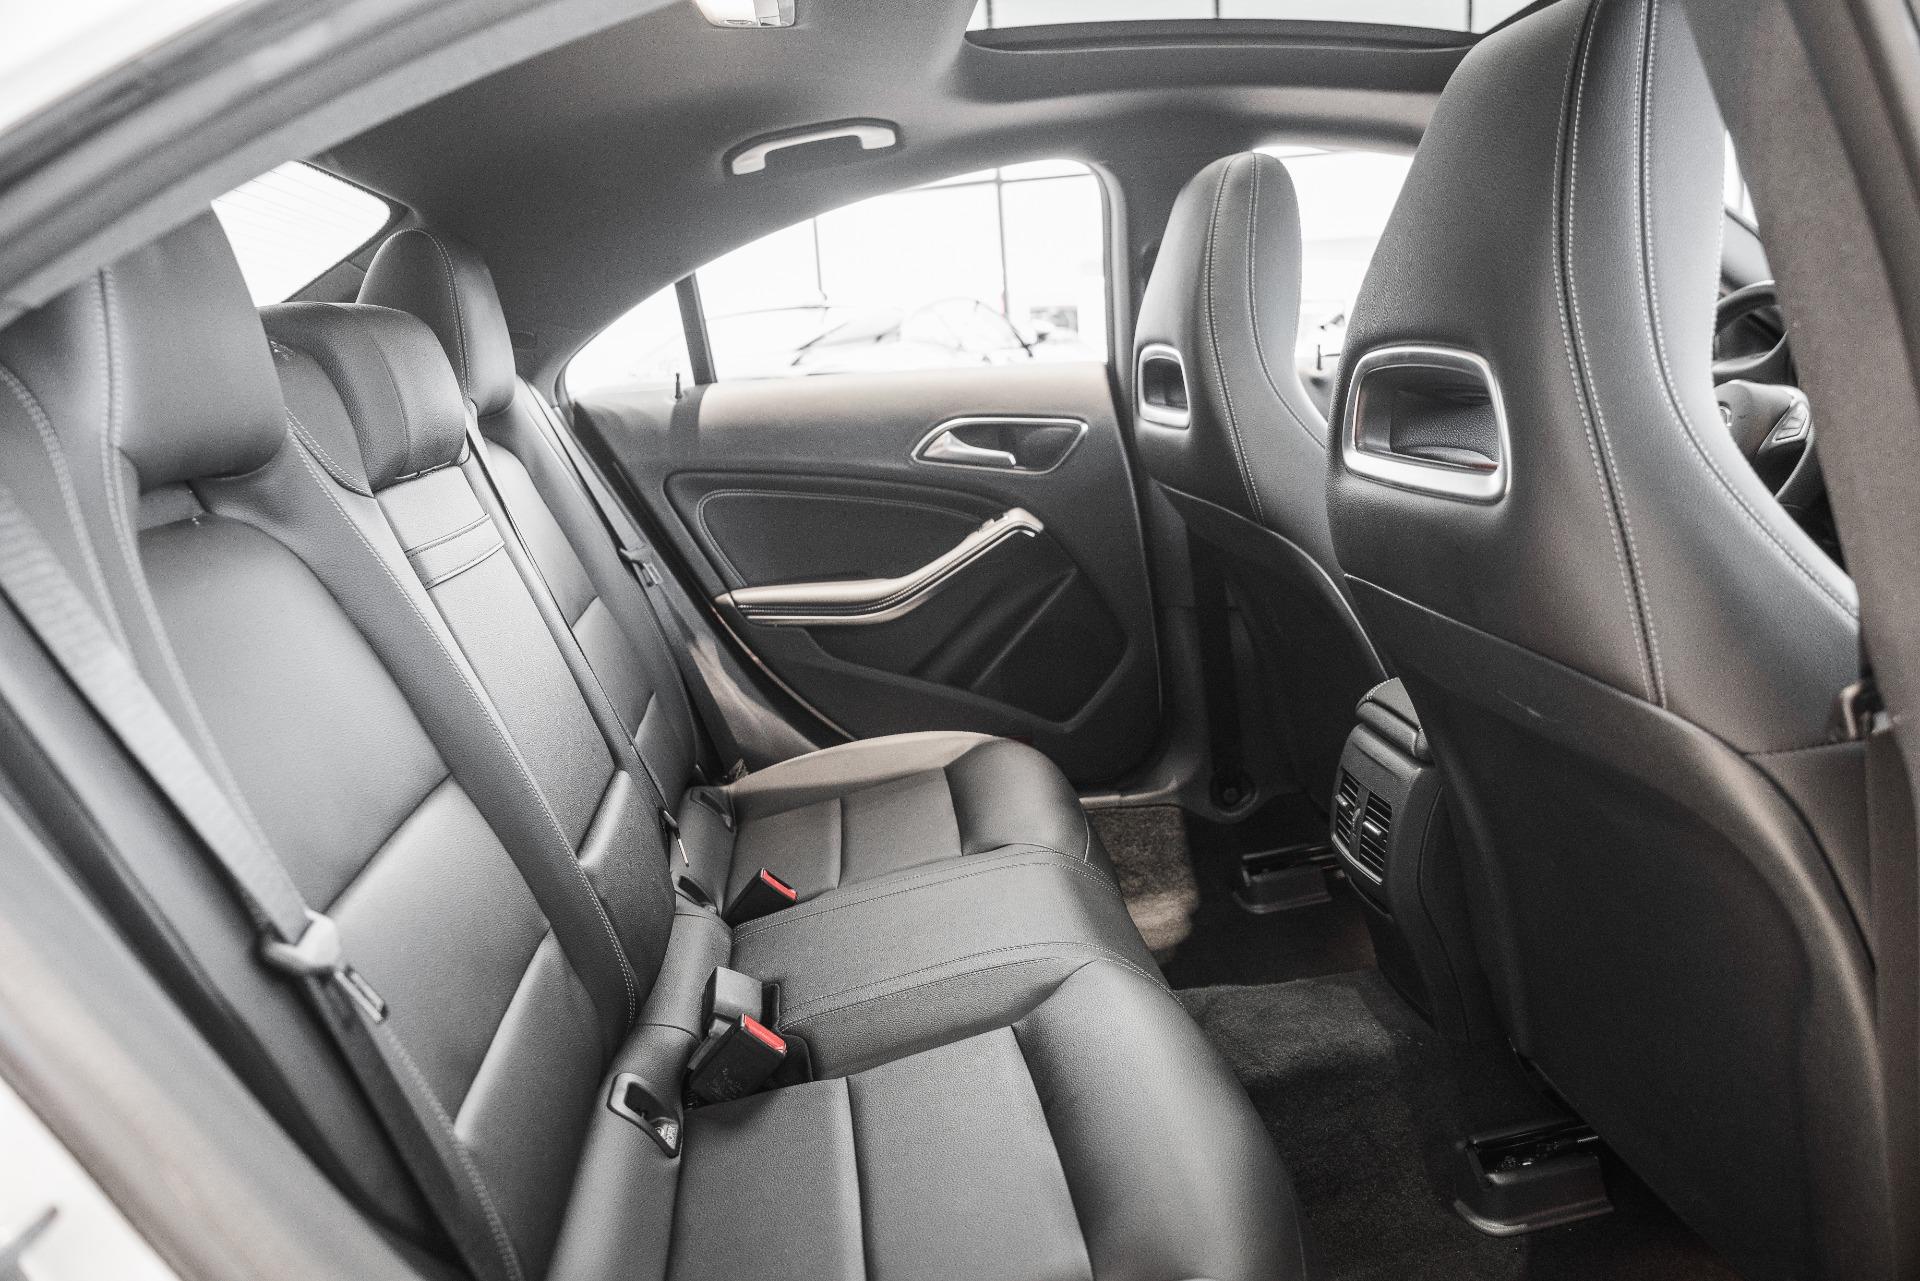 Used-2019-Mercedes-Benz-CLA-CLA-250-4MATIC